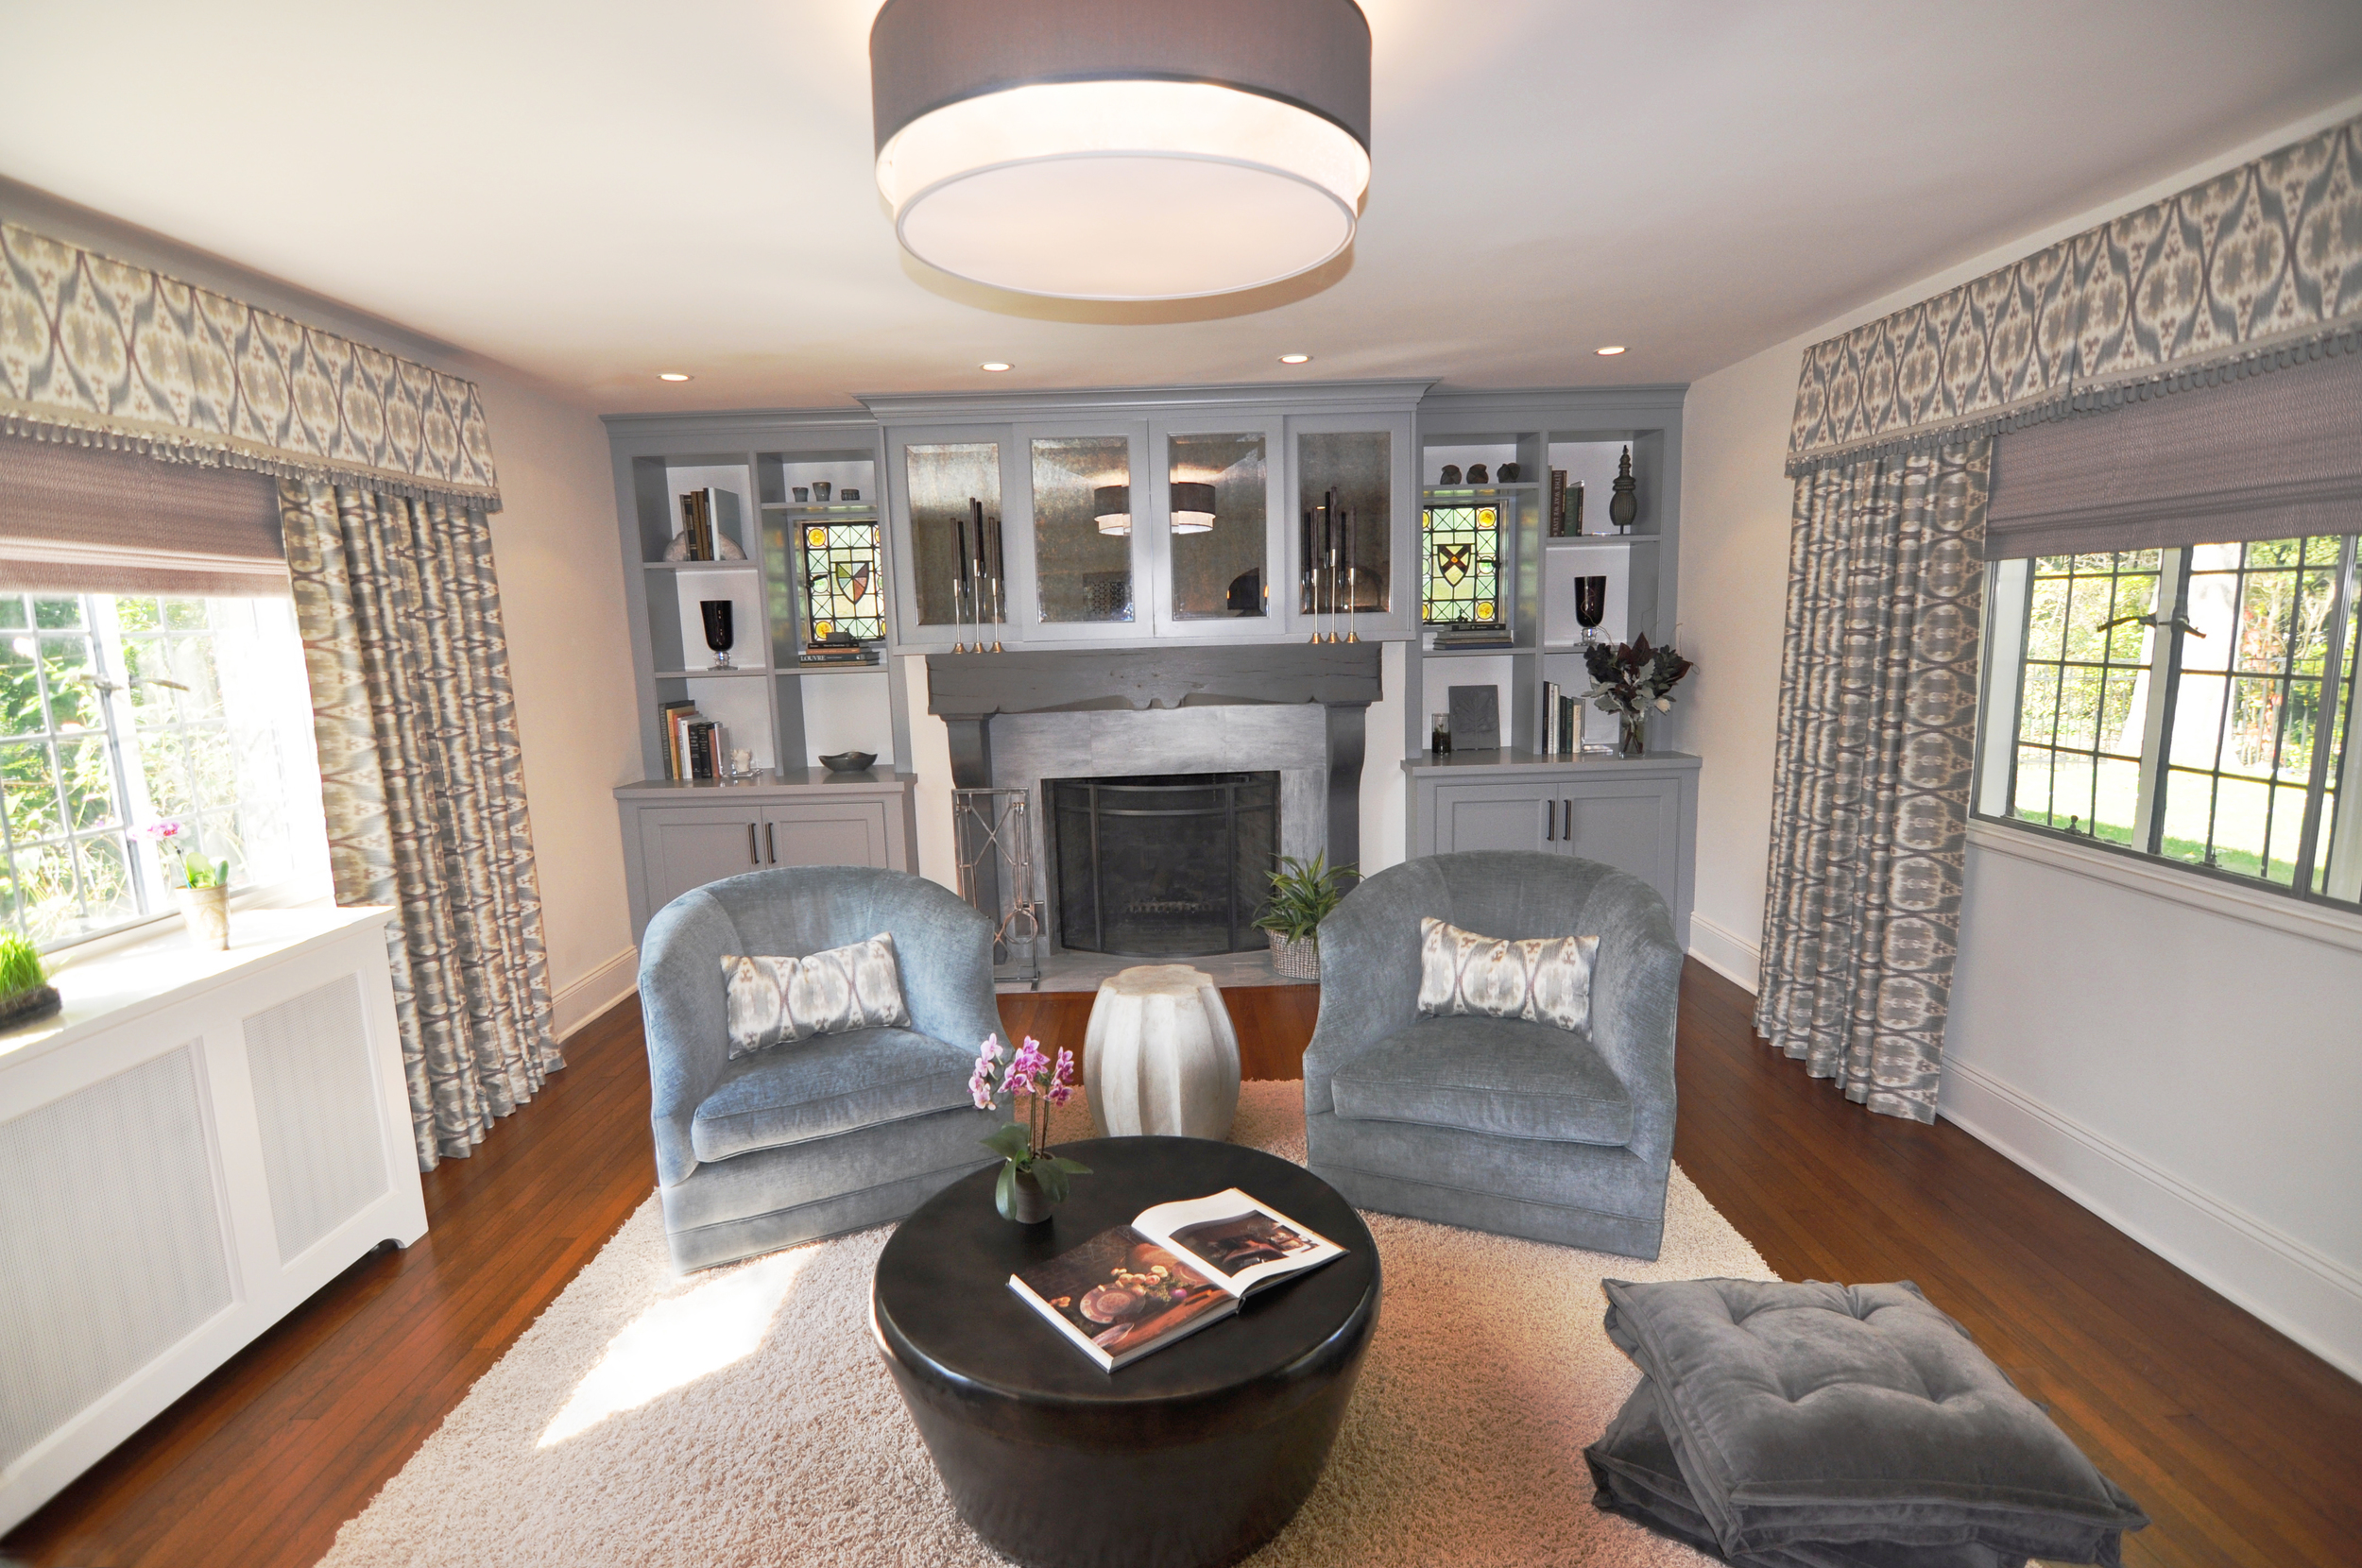 LIVING ROOM: FINAL IMPLEMENTED DESIGN